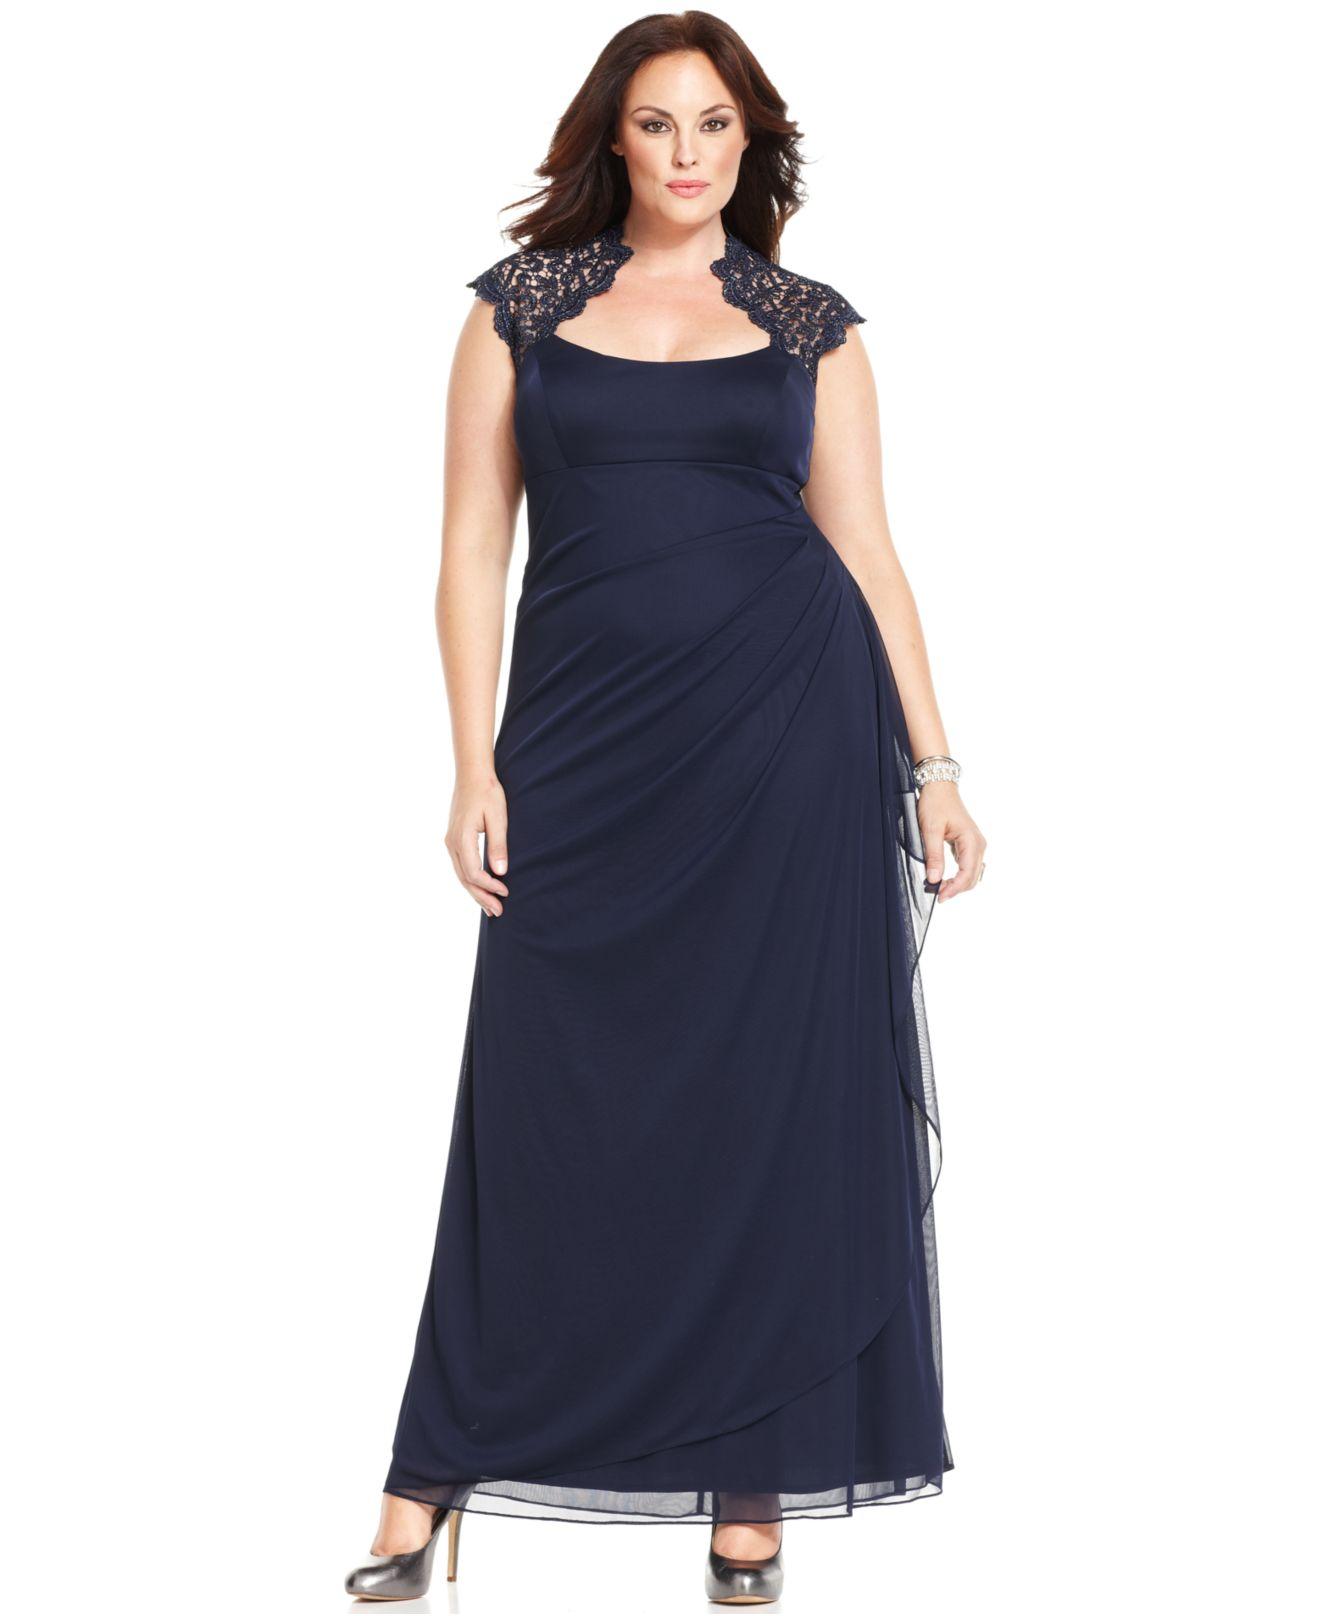 Xscape plus size dress three-quarter-sleeve lace - Boulcom dress ...